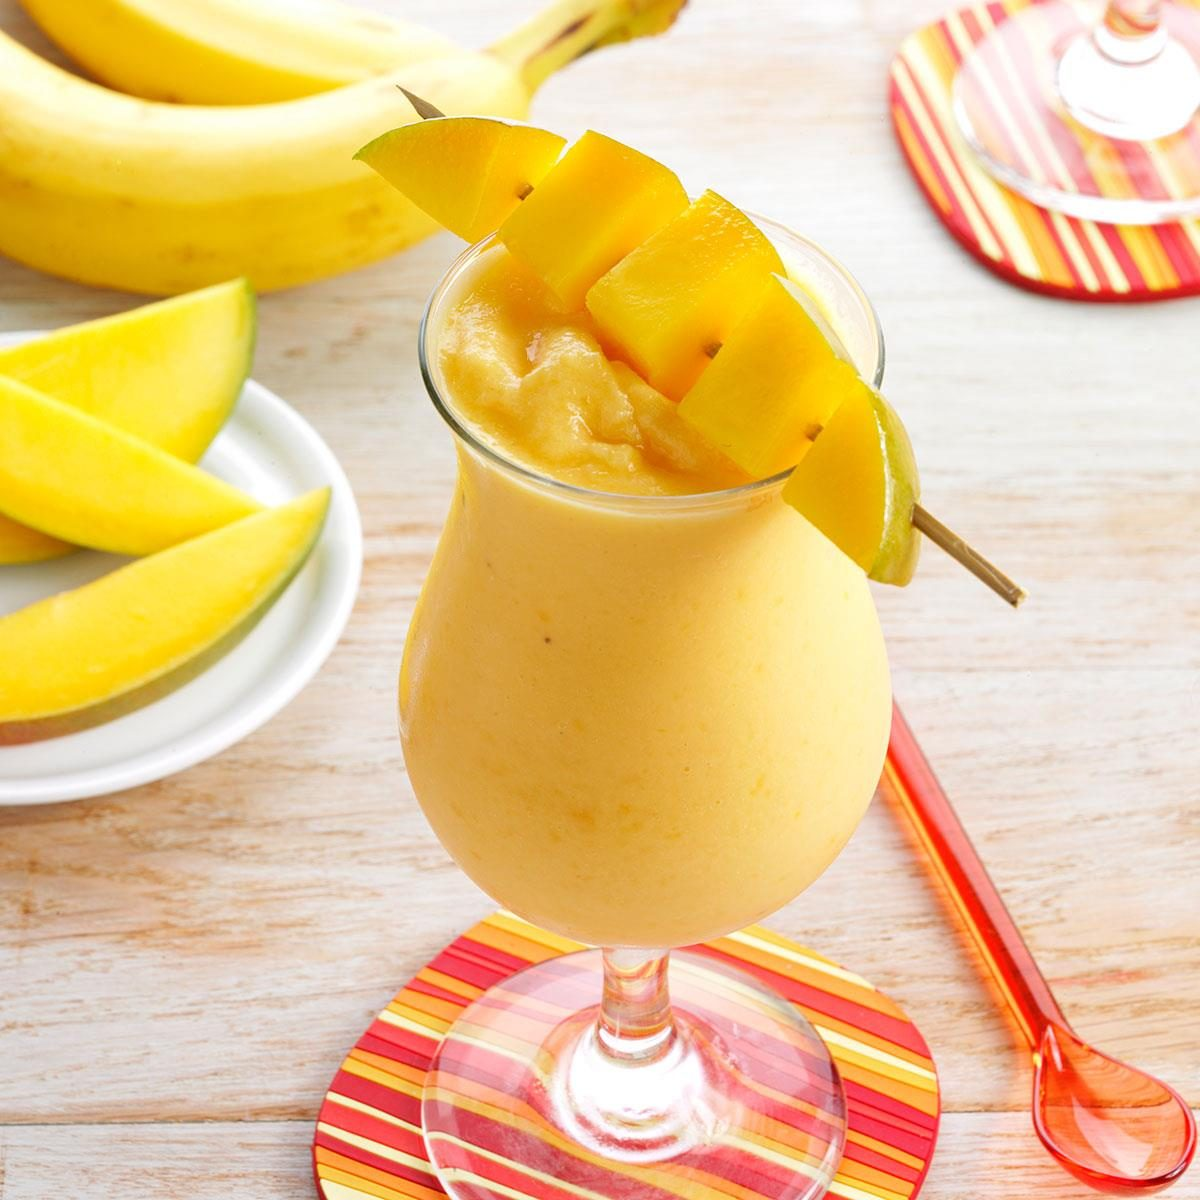 15 Recipes to Make Healthy Food Kid-Friendly